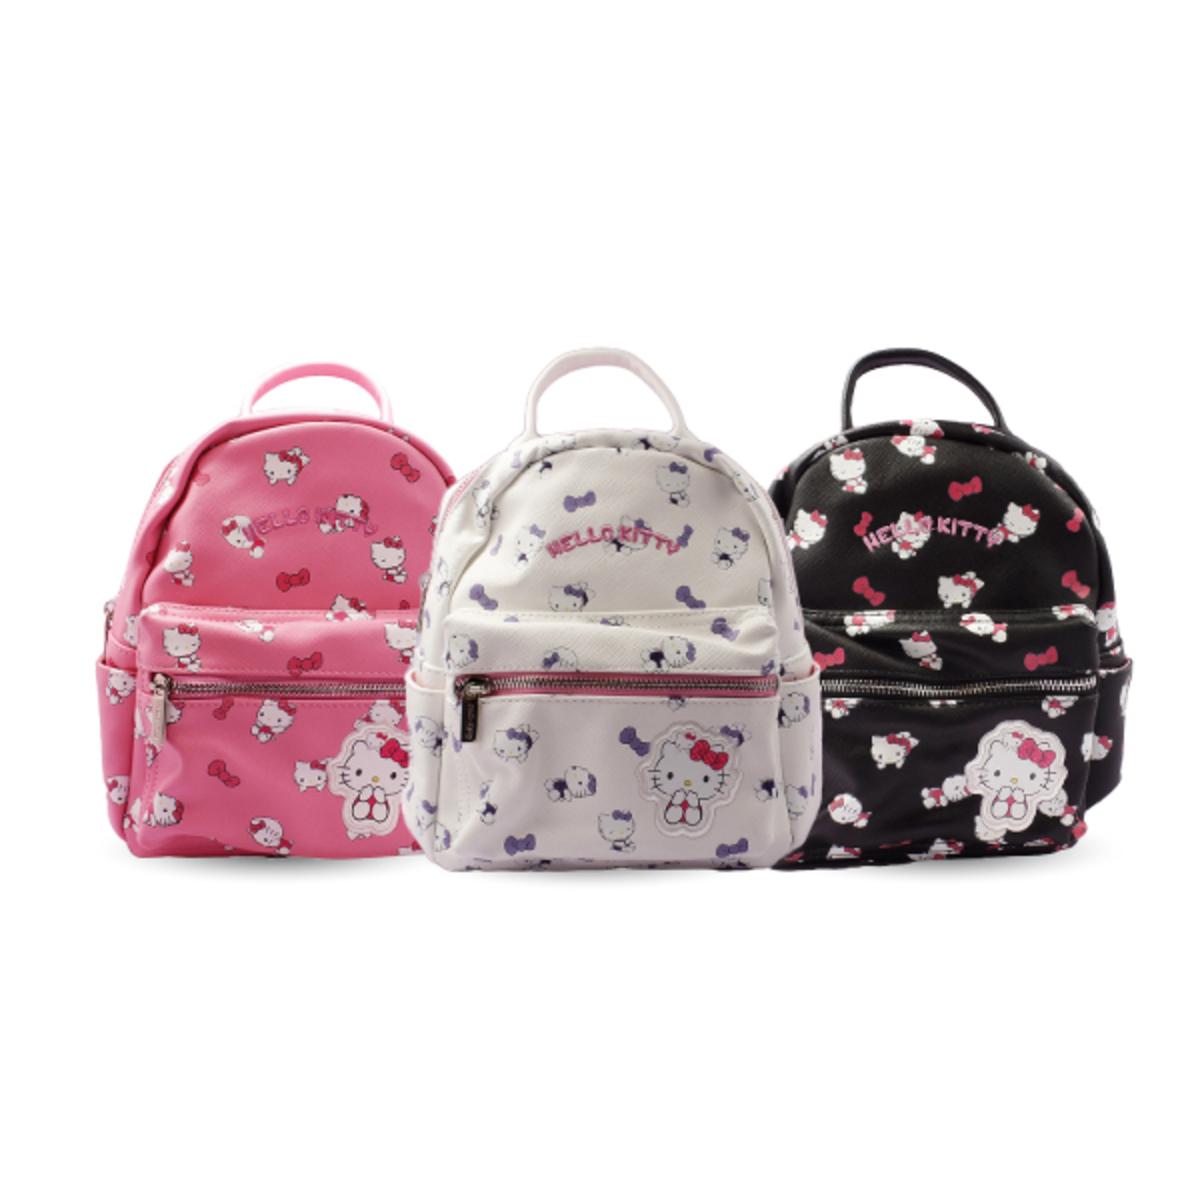 aaf4f55f8796 Hello Kitty Girls Compact School Backpack (HKBAG-213)